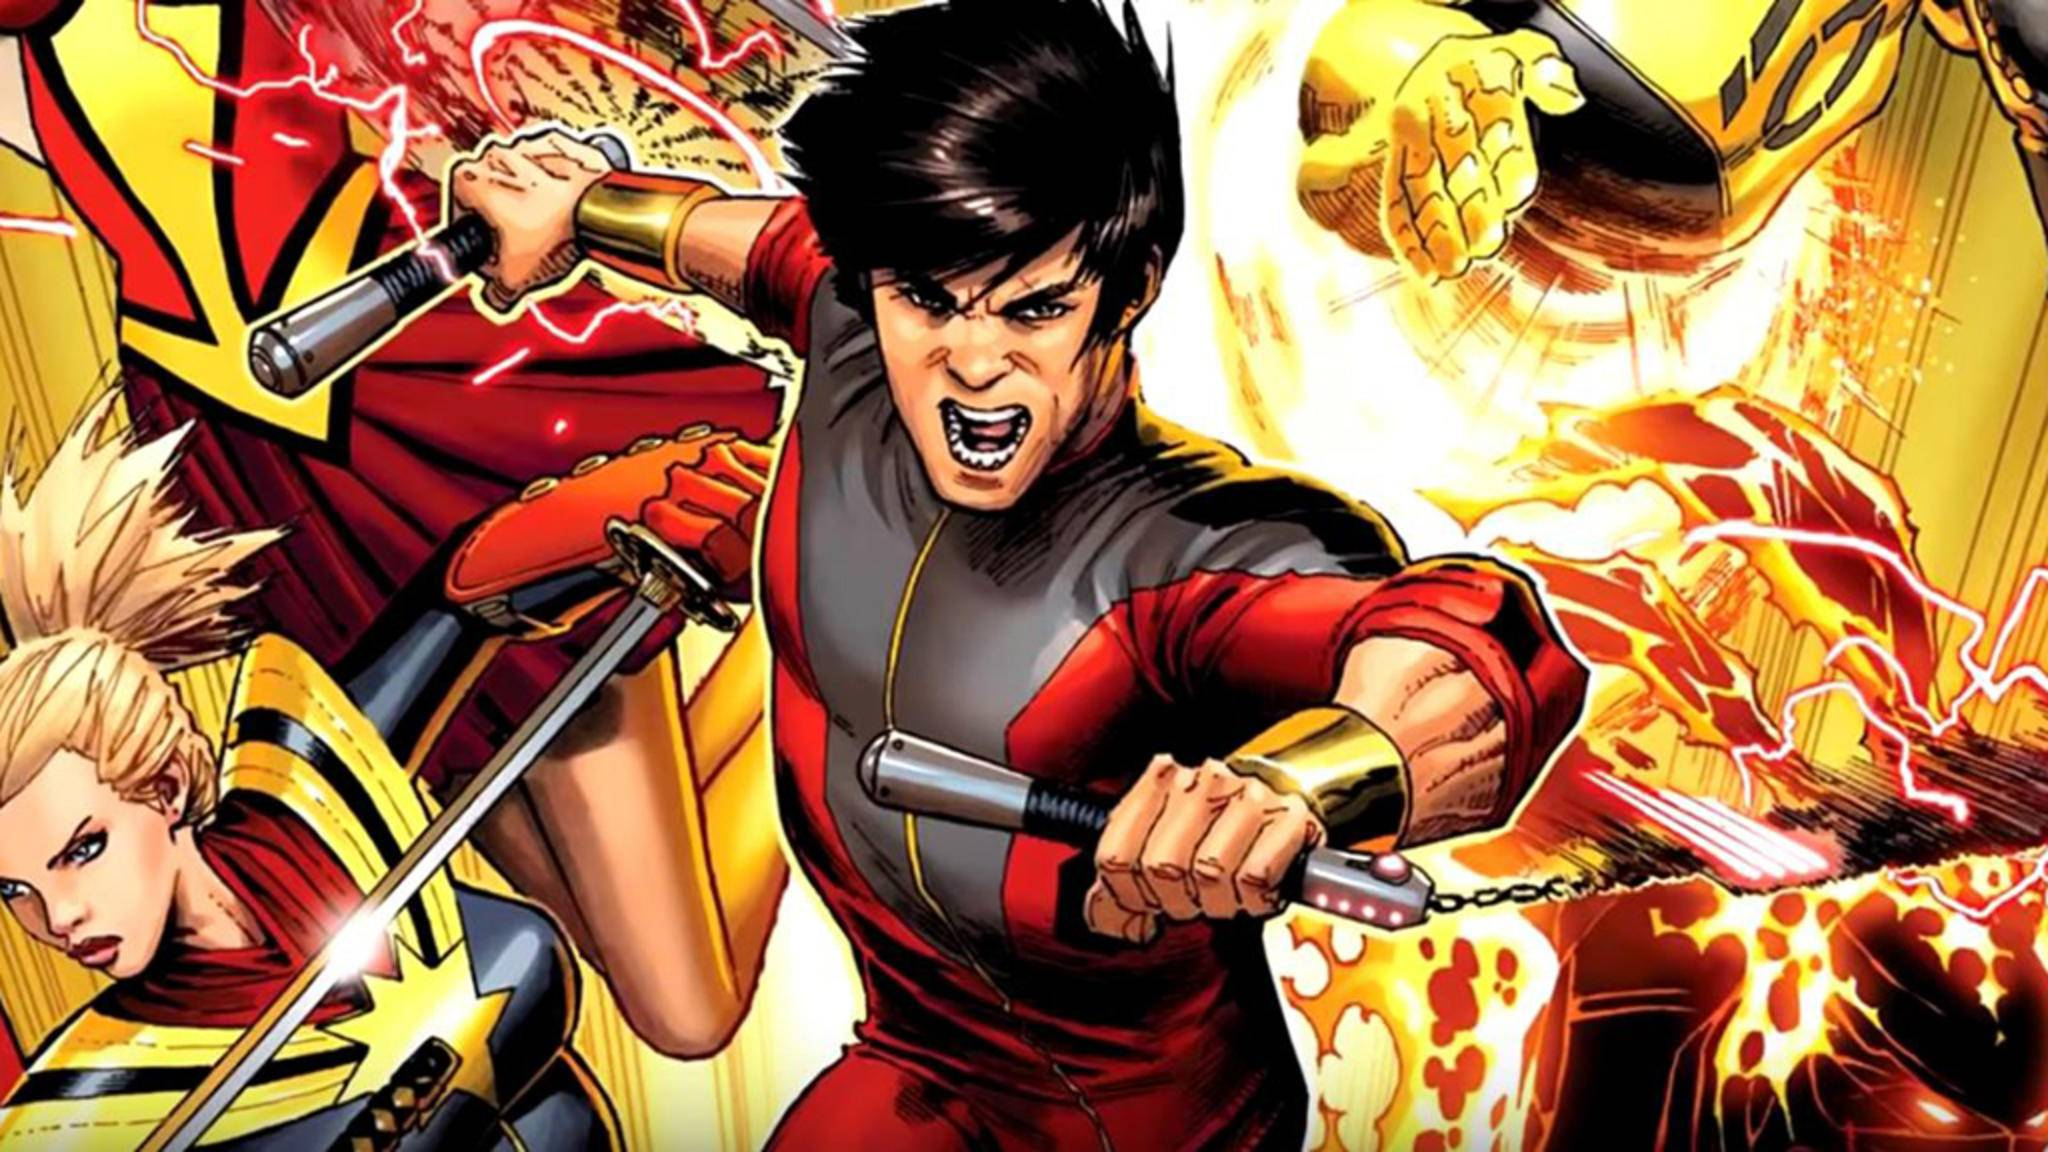 Marvels Martial-Arts-Superheld Shang-Chi erobert bald die Leinwand.